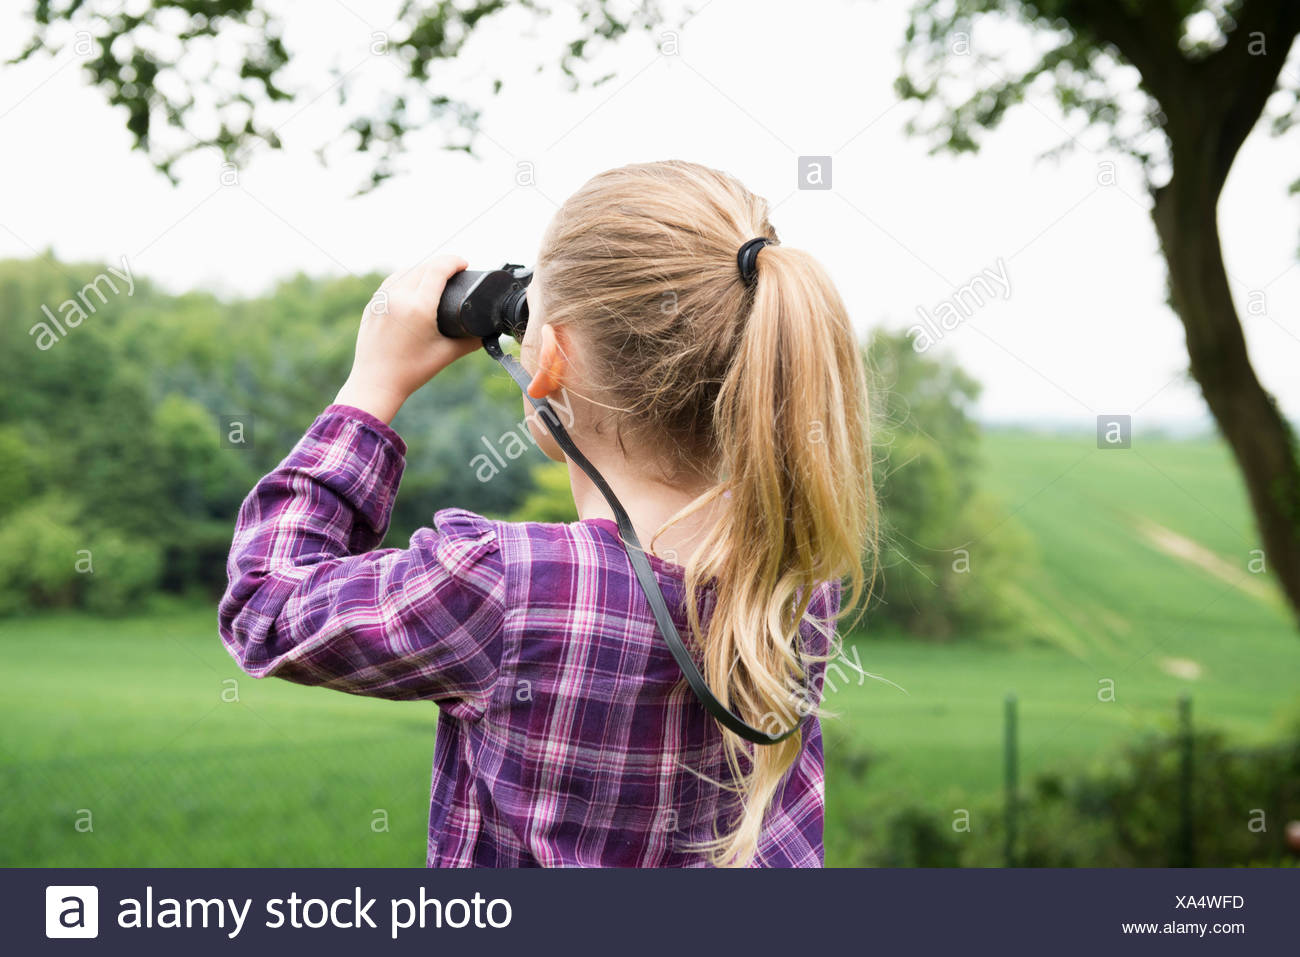 Girl using binoculars - Stock Image